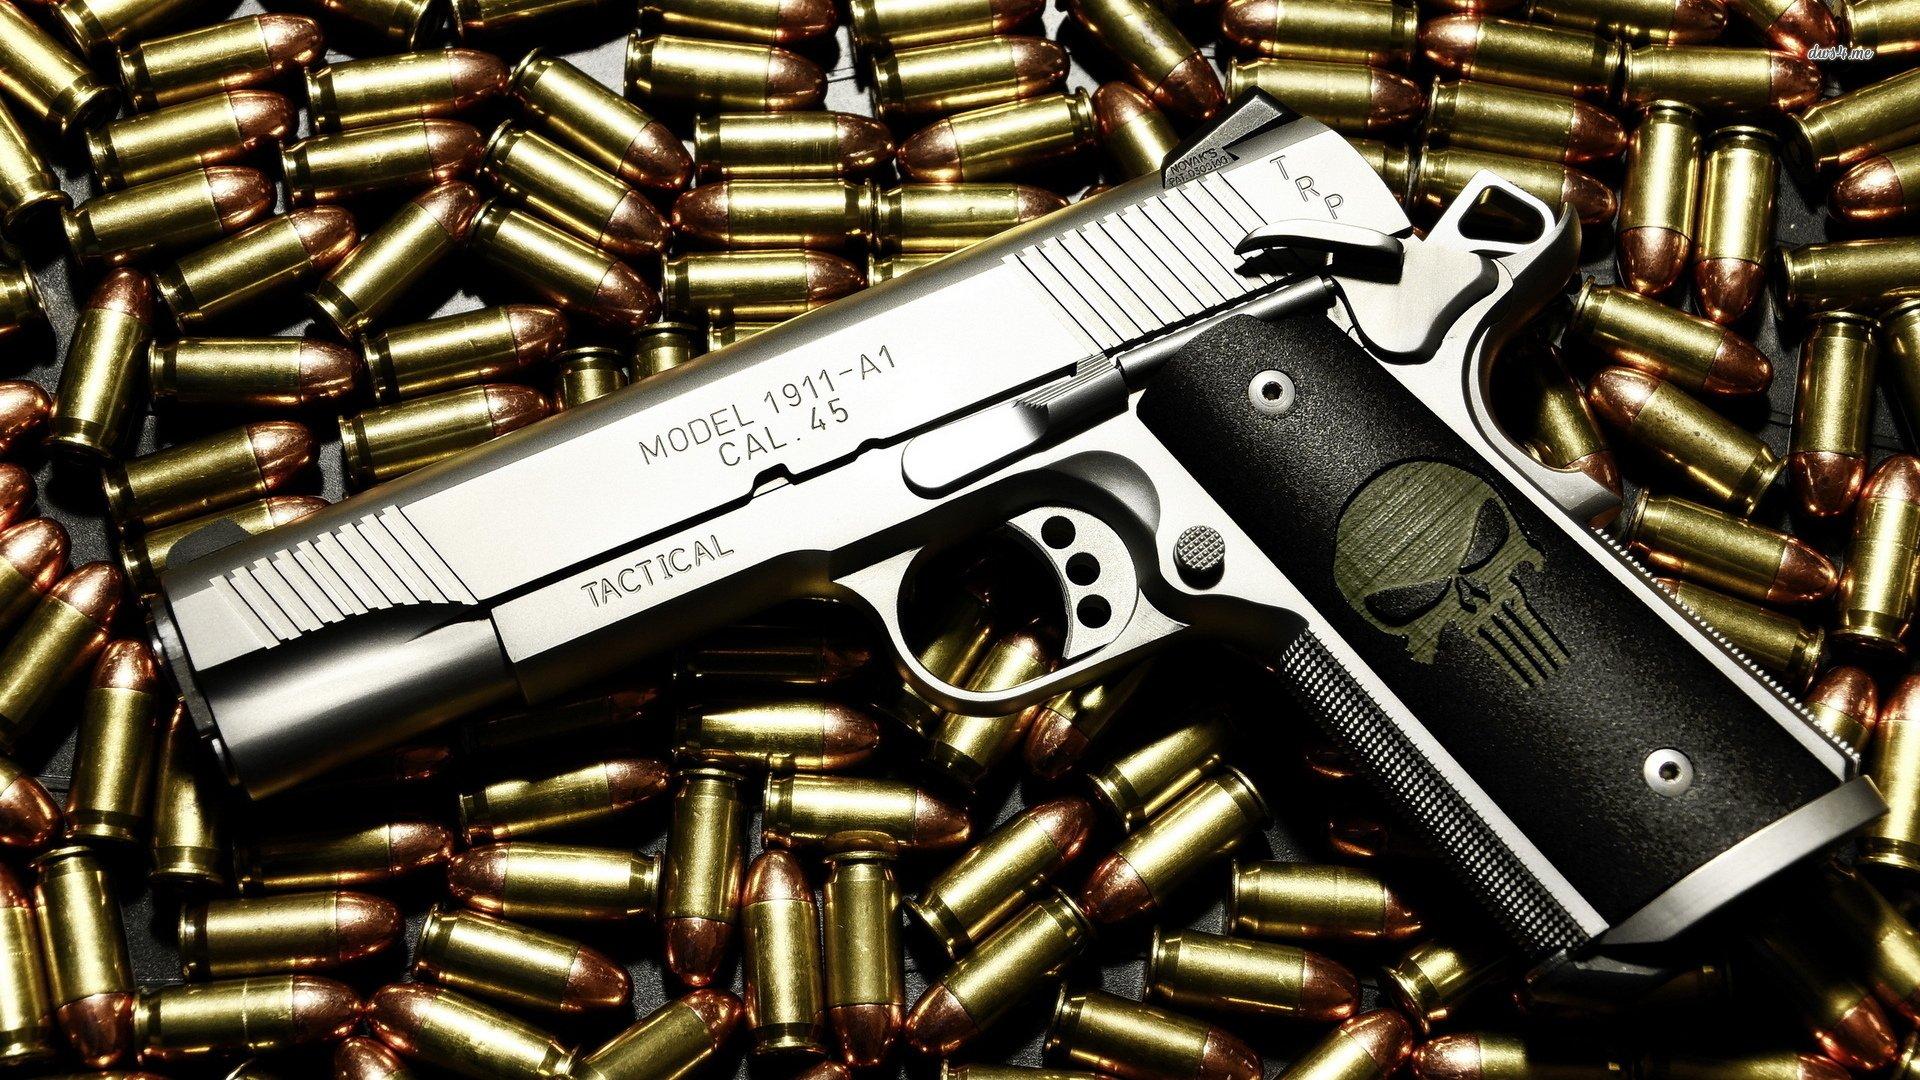 free photo: gun and bullets - rows, war, protection - free download